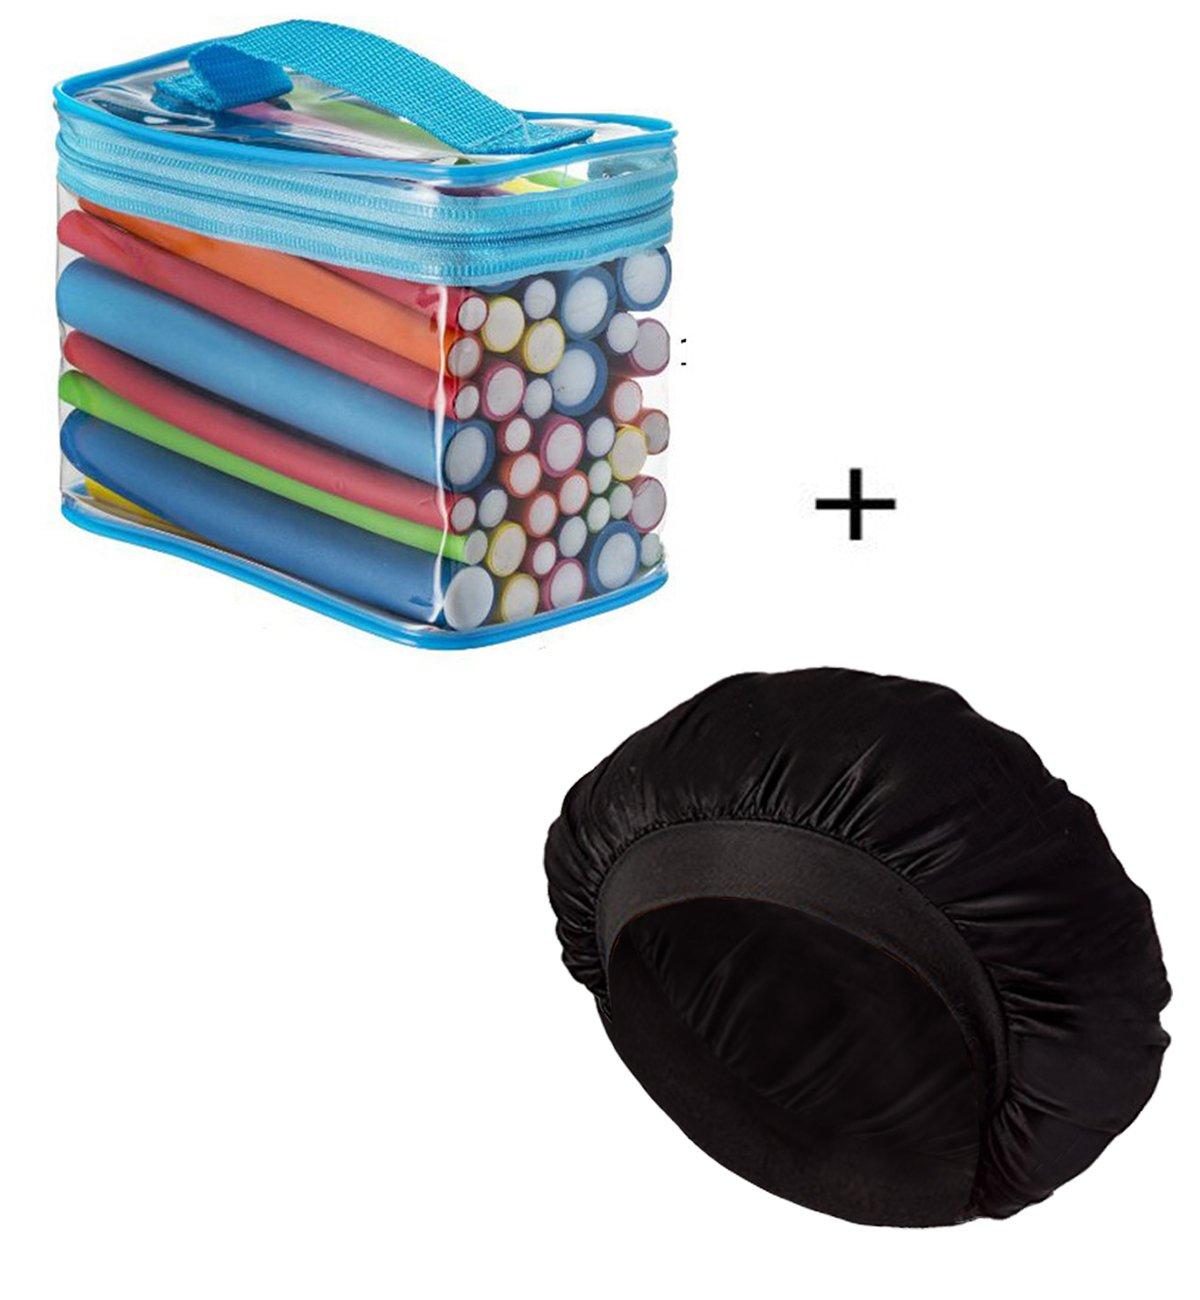 (2 In 1) 42 Packs Hair Rollers Flexible Curling Rods + Satin Bonnet Hat Sleeping Cap